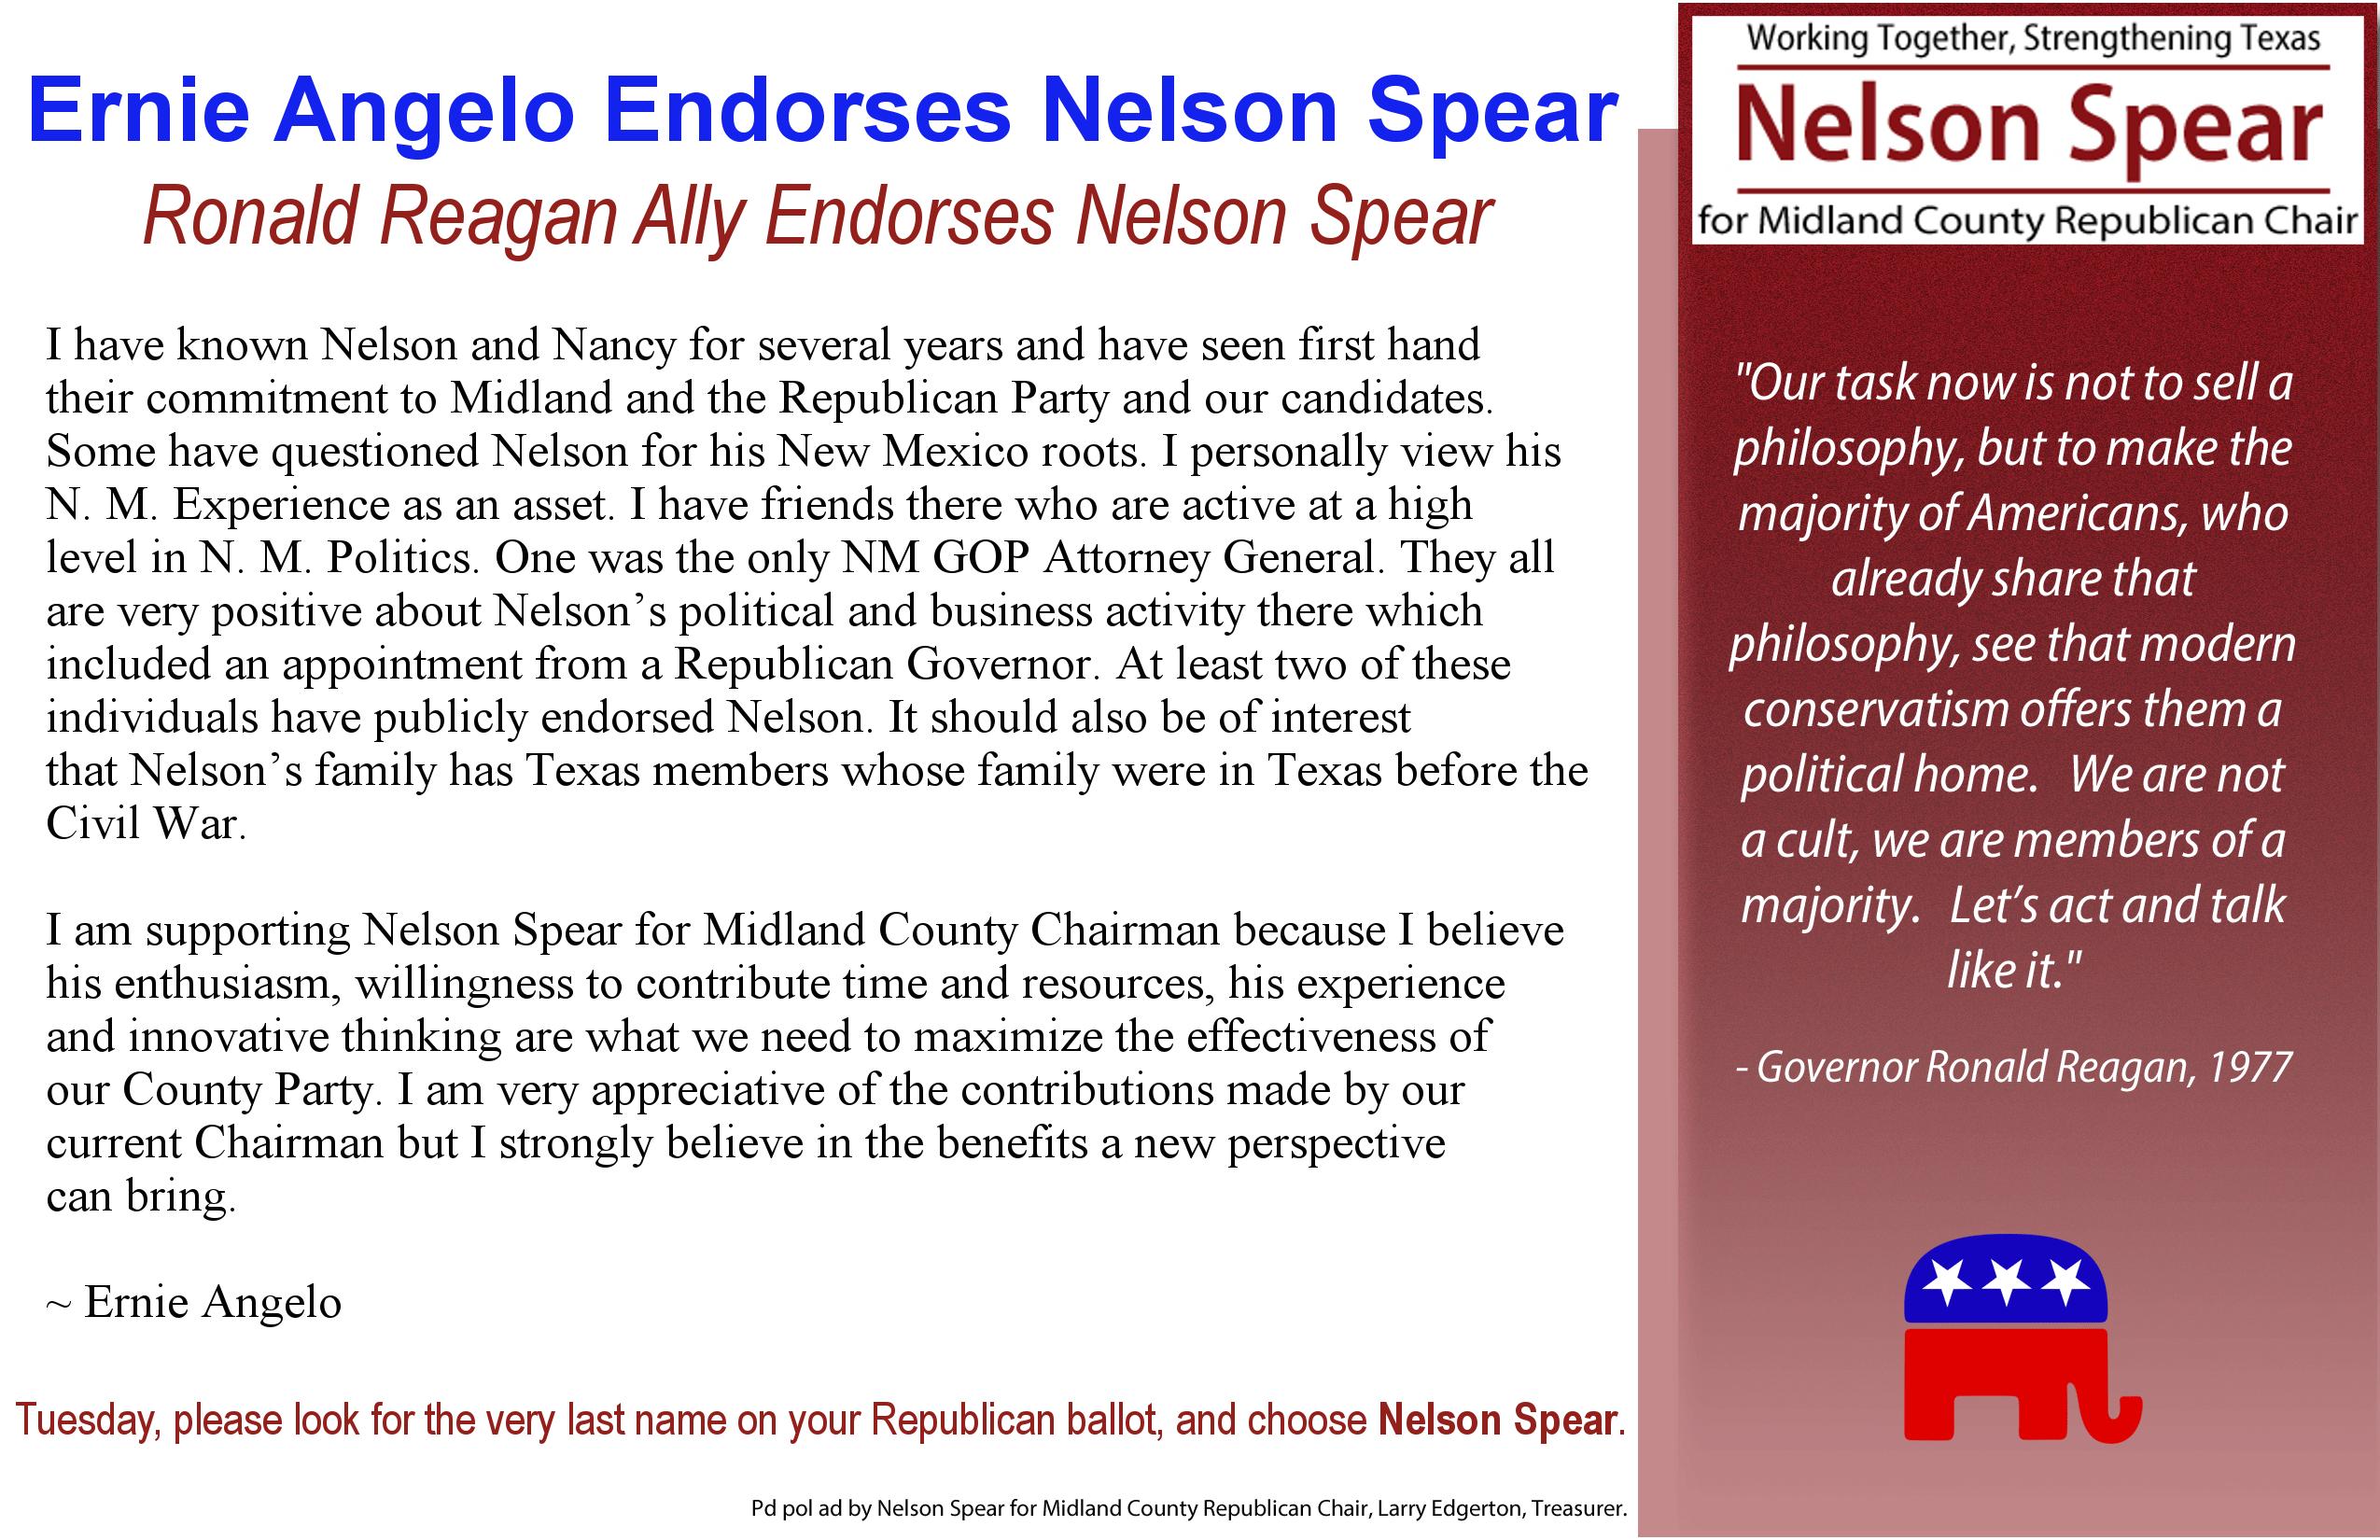 Ronald Reagan Ally Ernie Angelo Endorses Nelson Spear